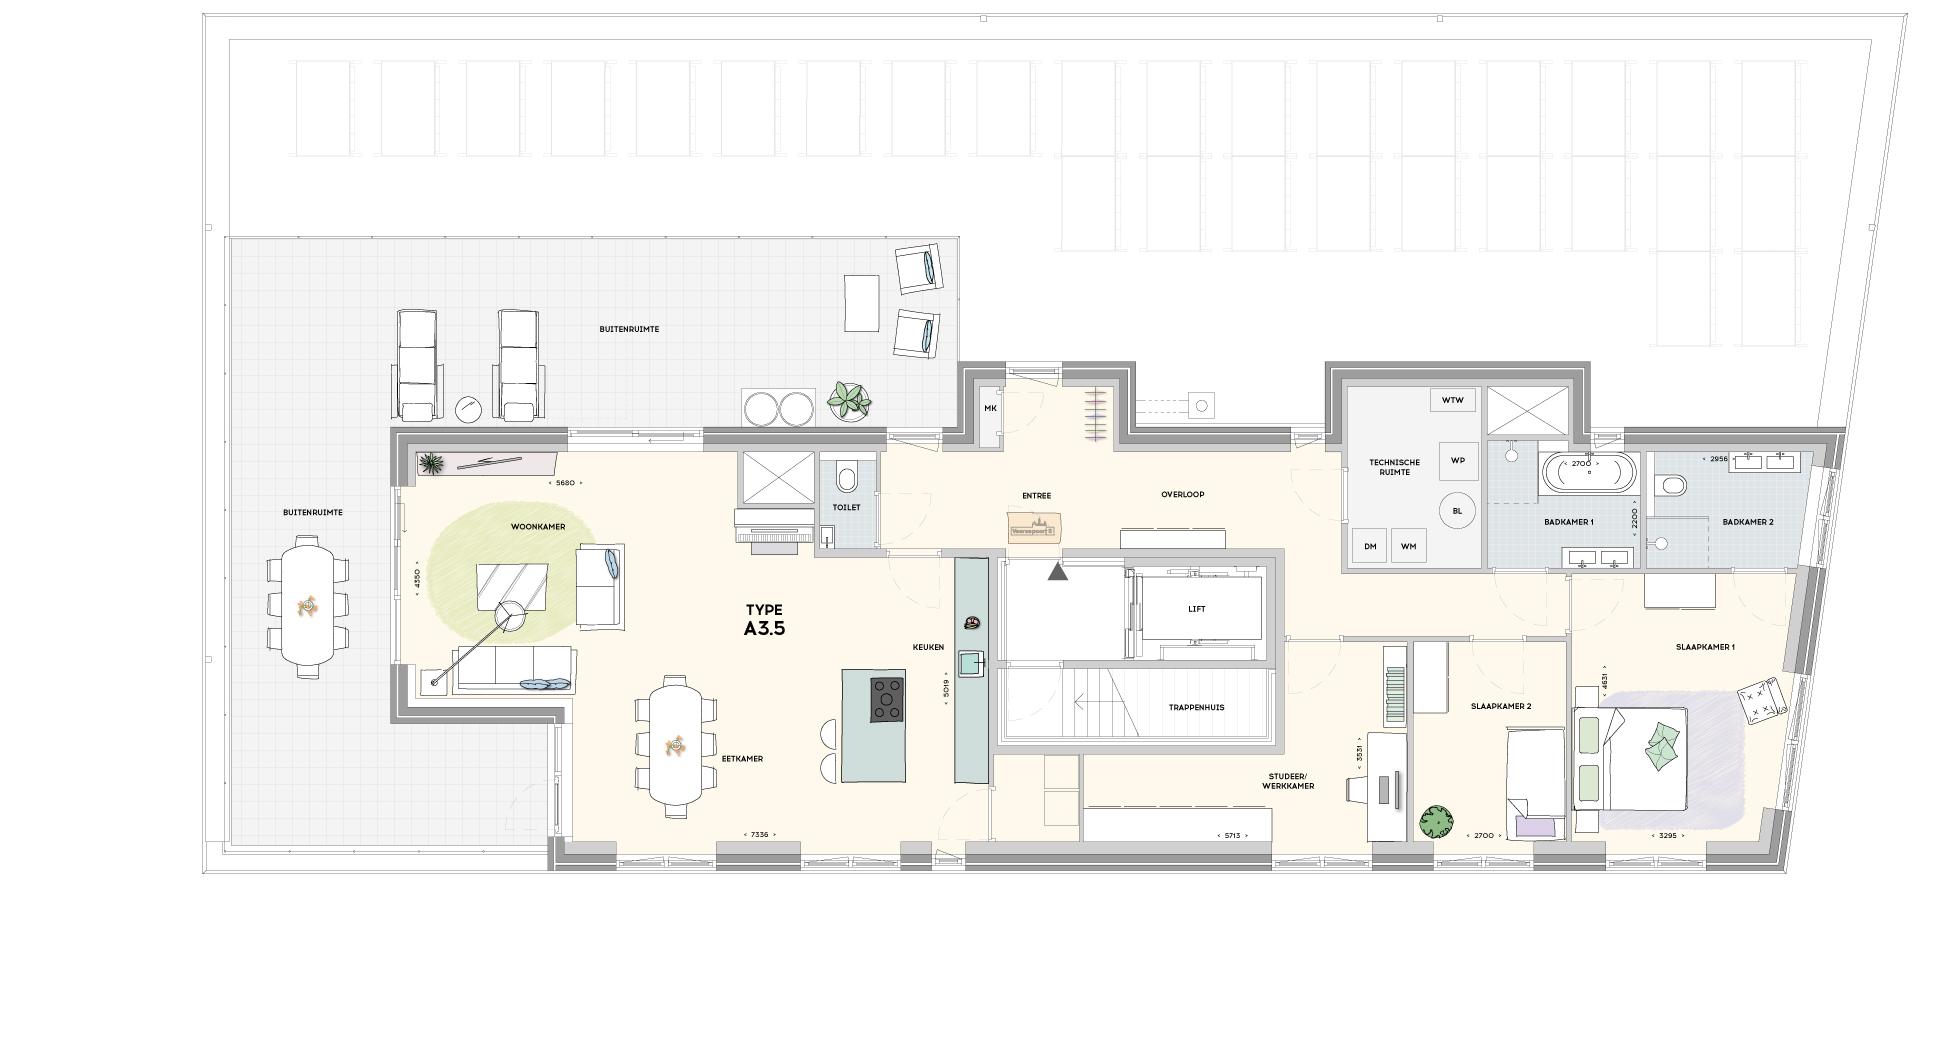 Gebouw 3 penthouse